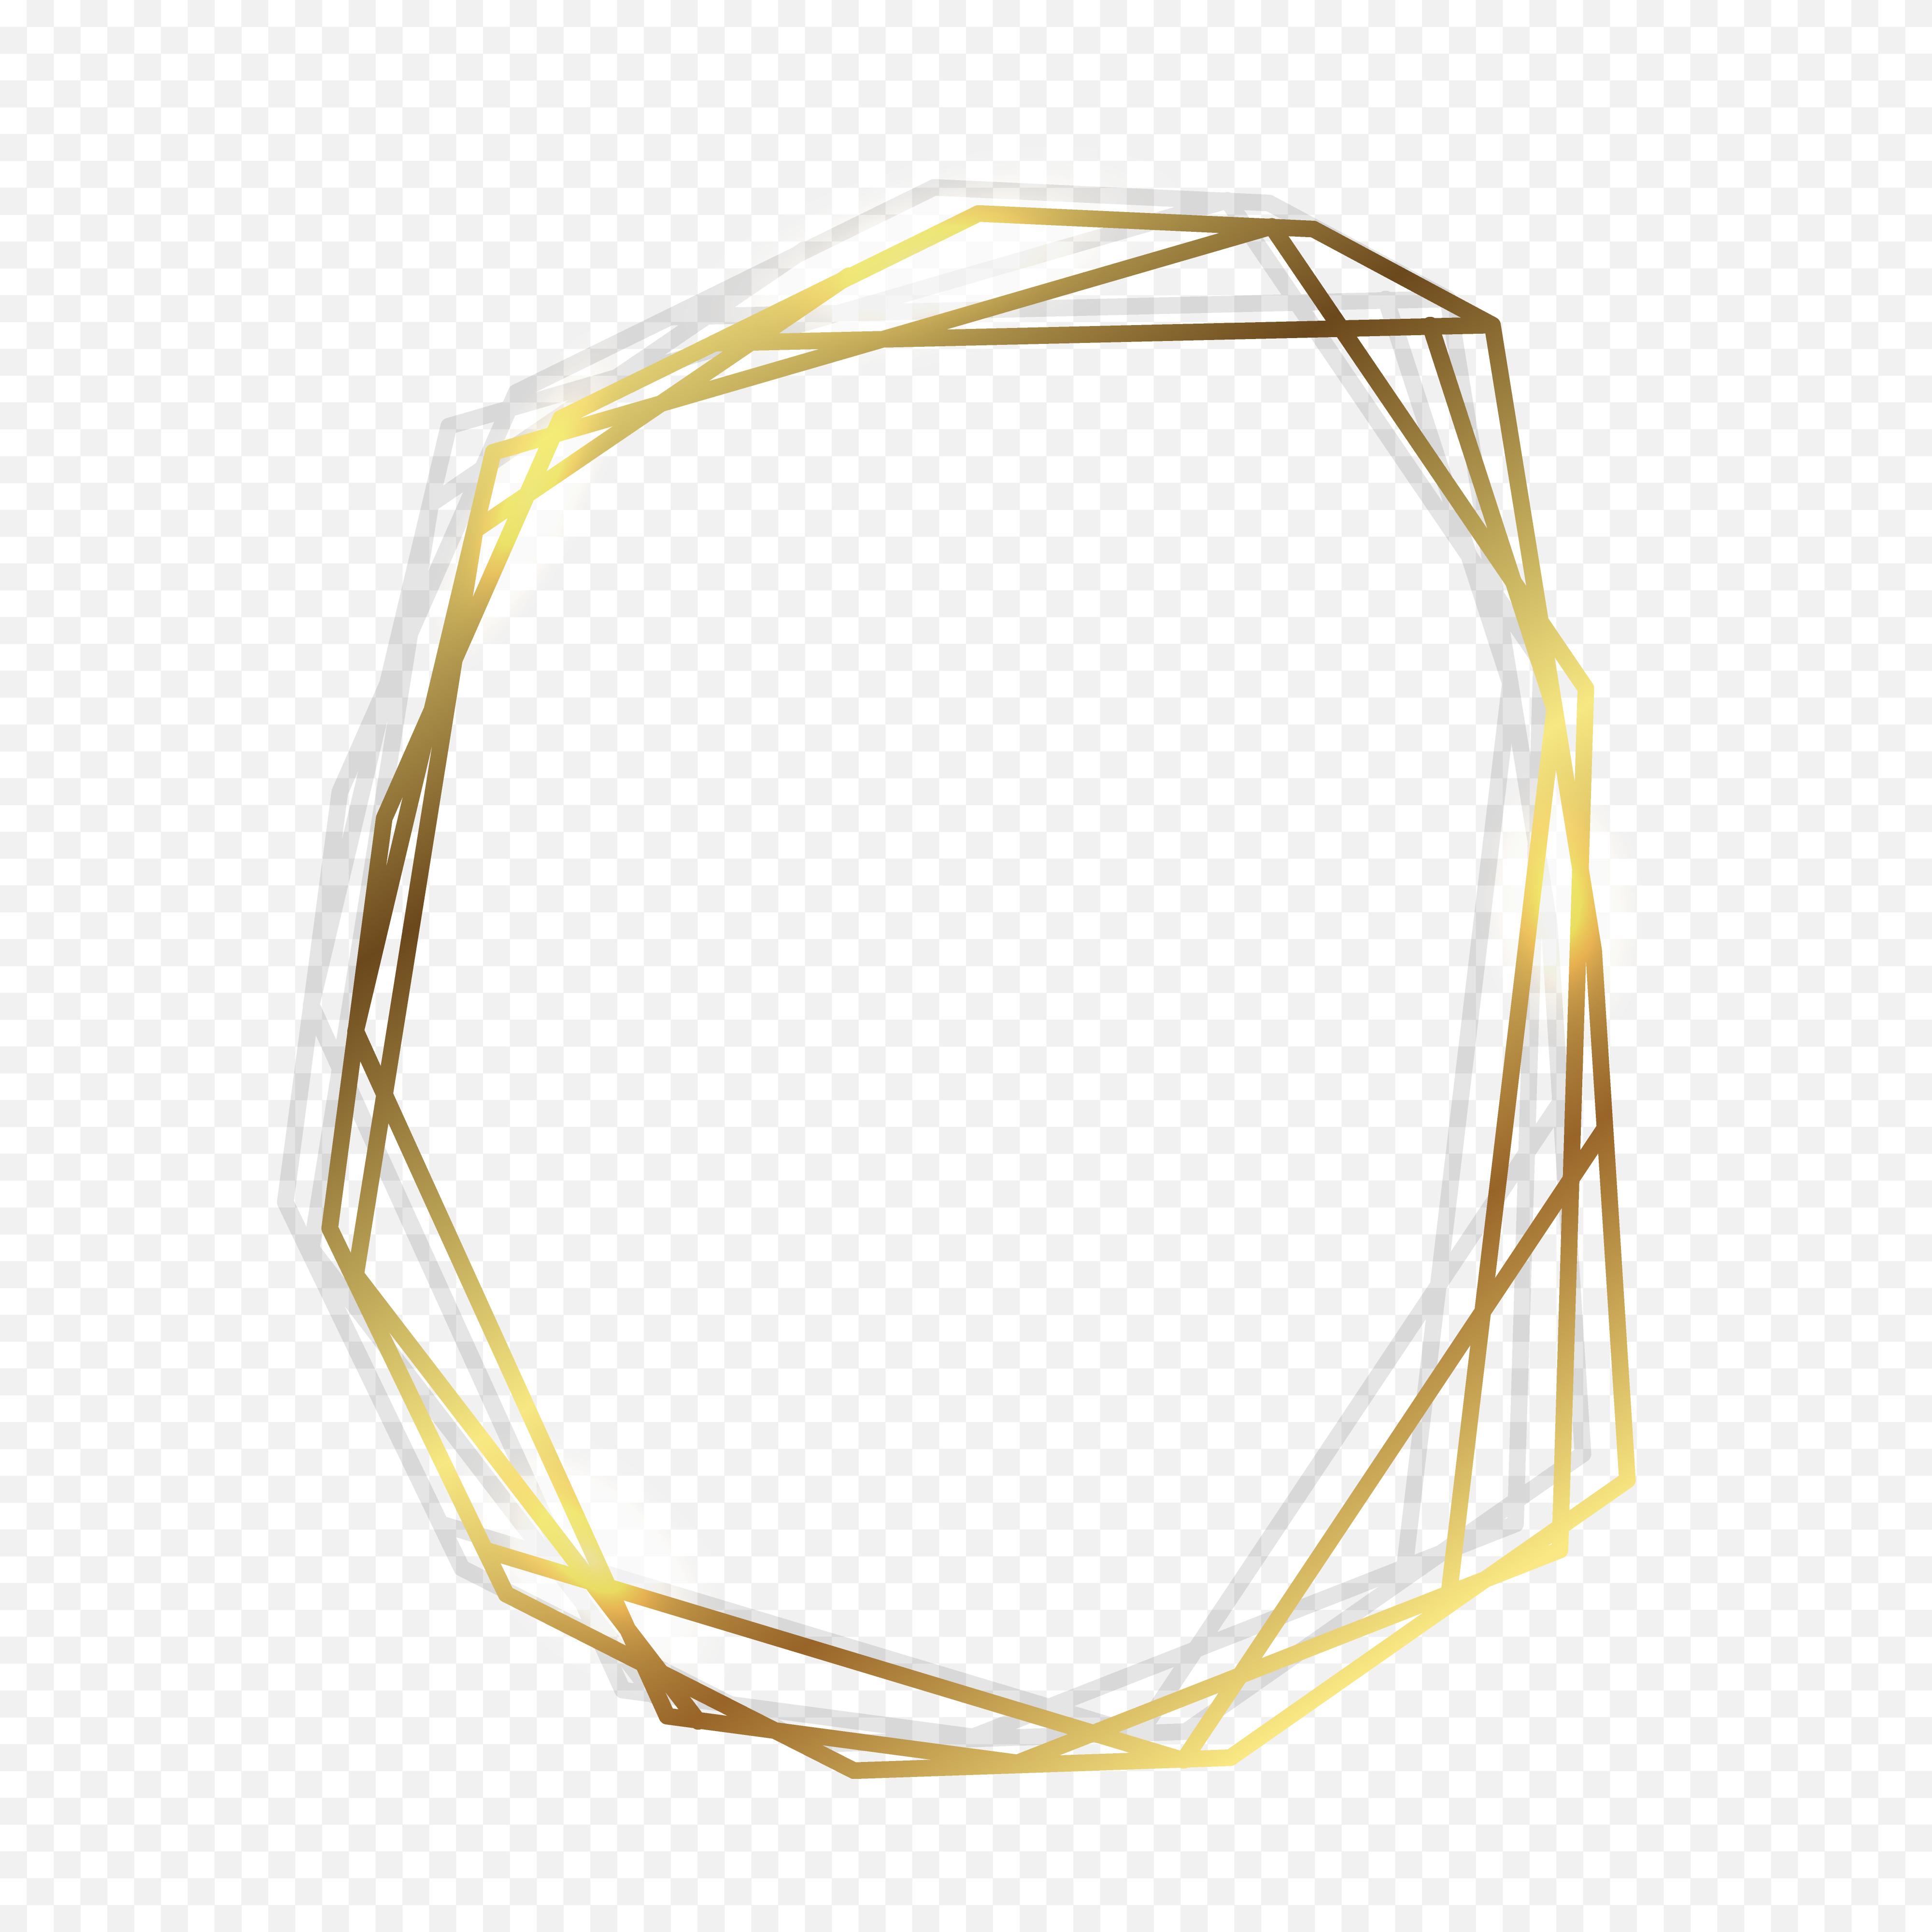 Gold geometric frame.